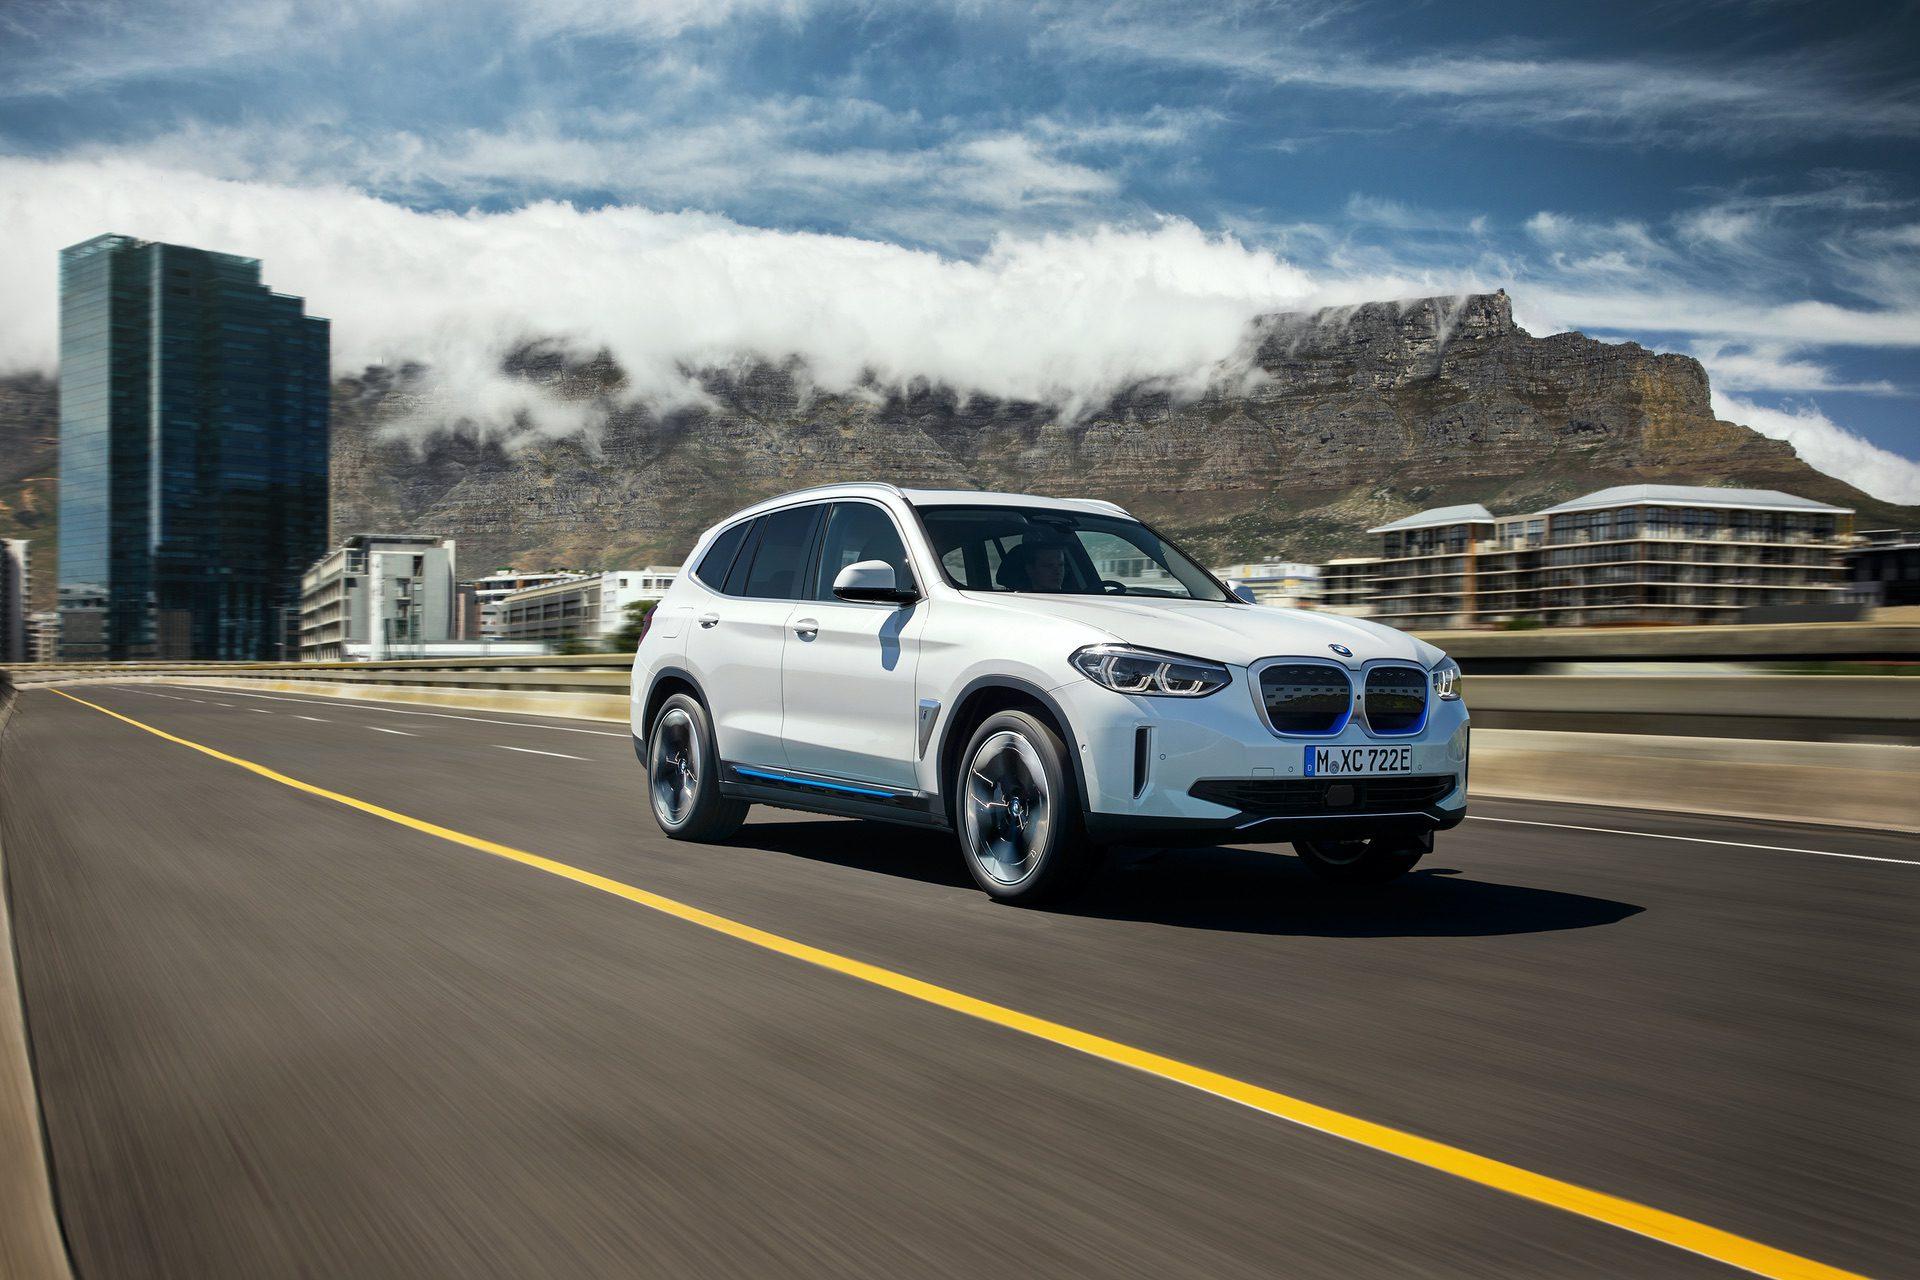 2020 BMW iX3 electric SUV 07